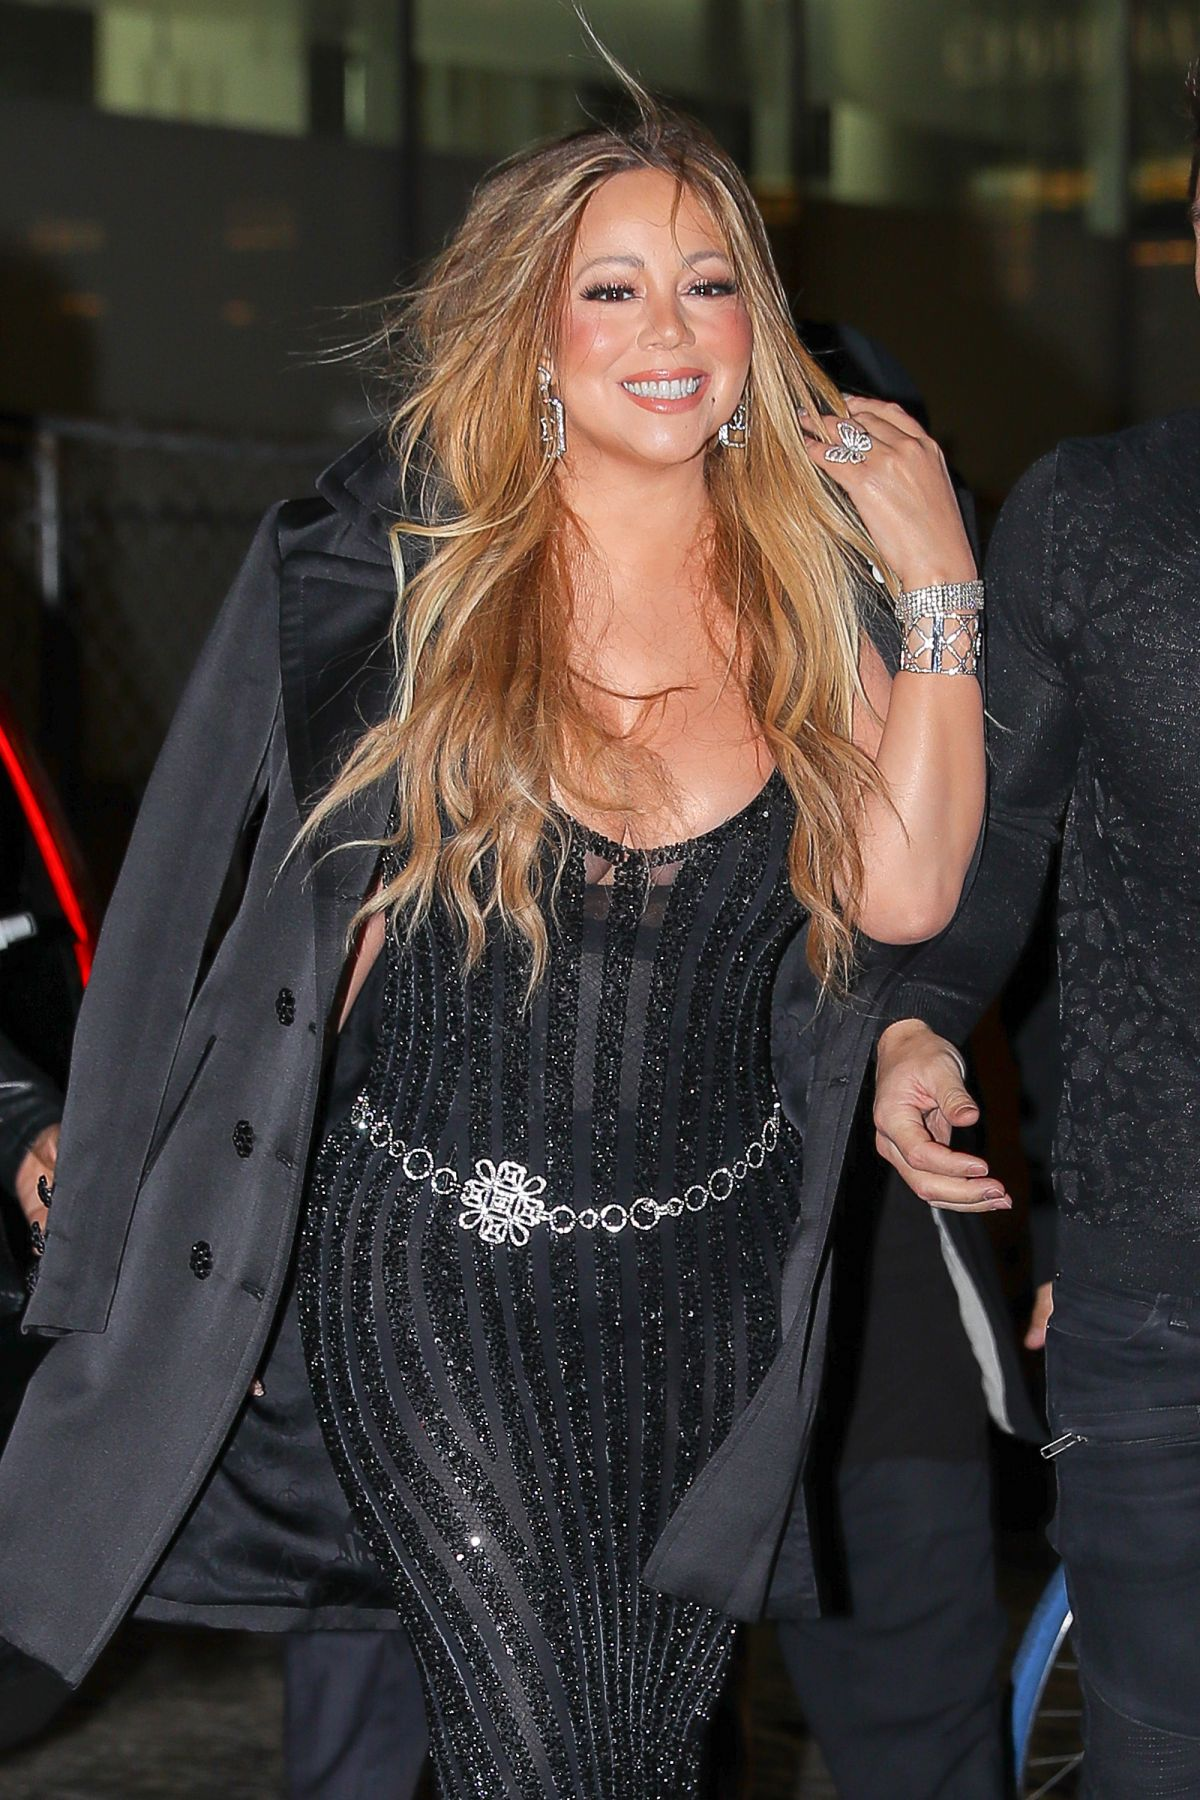 Mariah Carey Archives - Page 2 of 25 - HawtCelebs - HawtCelebs Mariah Carey